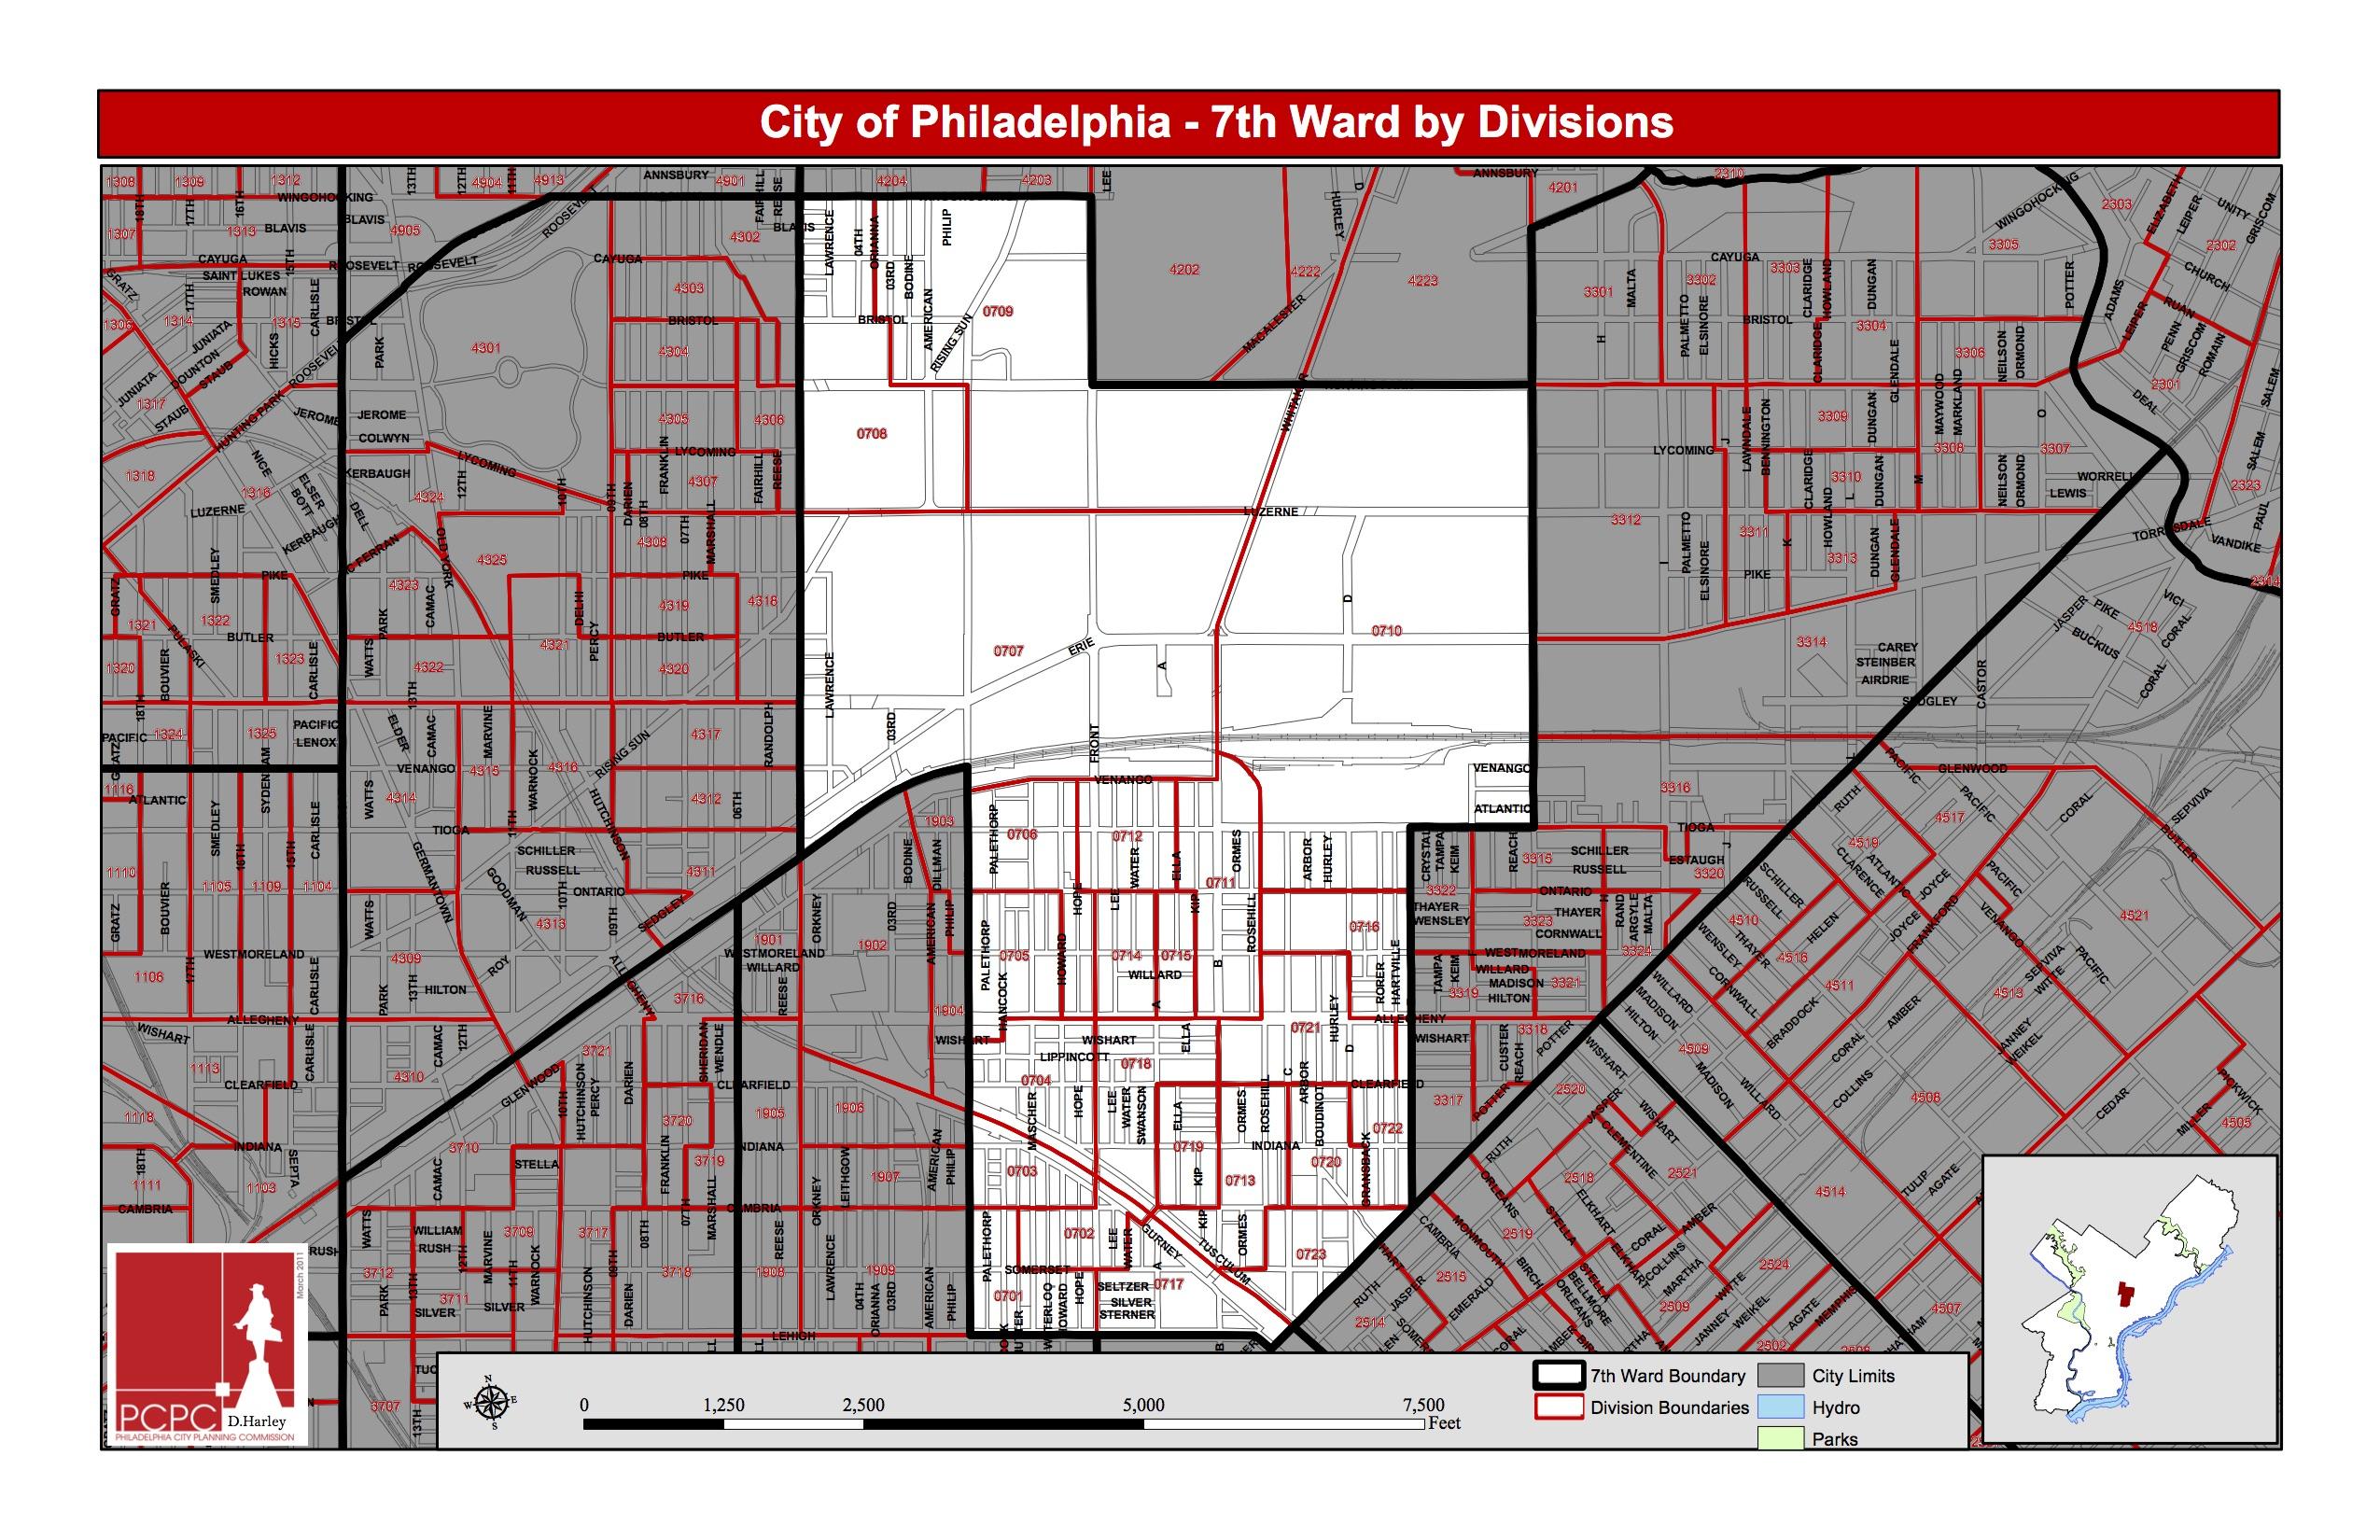 7th Ward of Philadelphia (Courtesy of www.seventy.org)